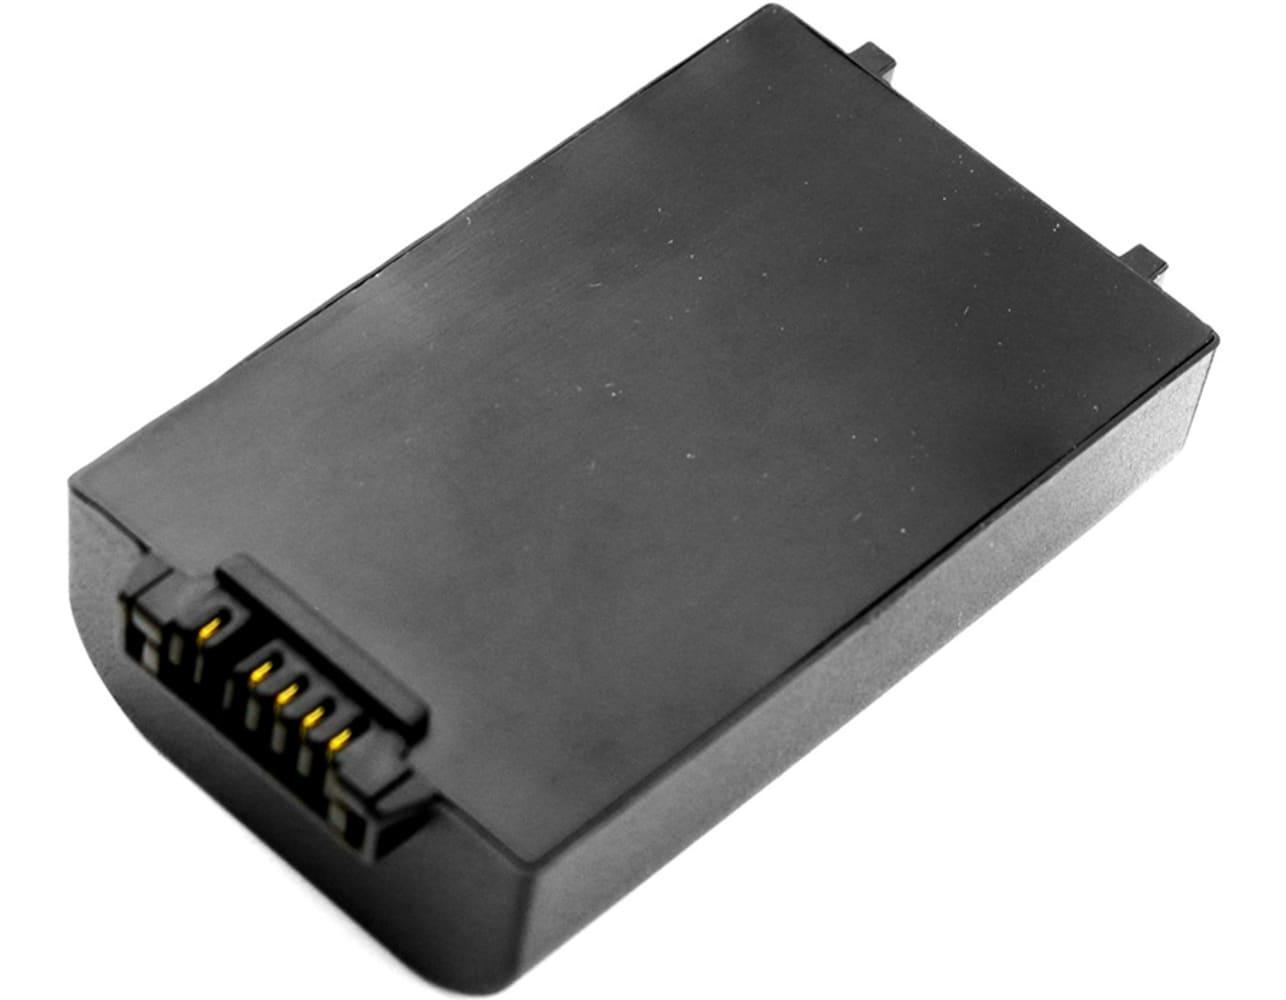 Batterie pour Honeywell Dolphin 99EX, 99EXhc, 99GX - 99EX-BTES-1 6800mAh